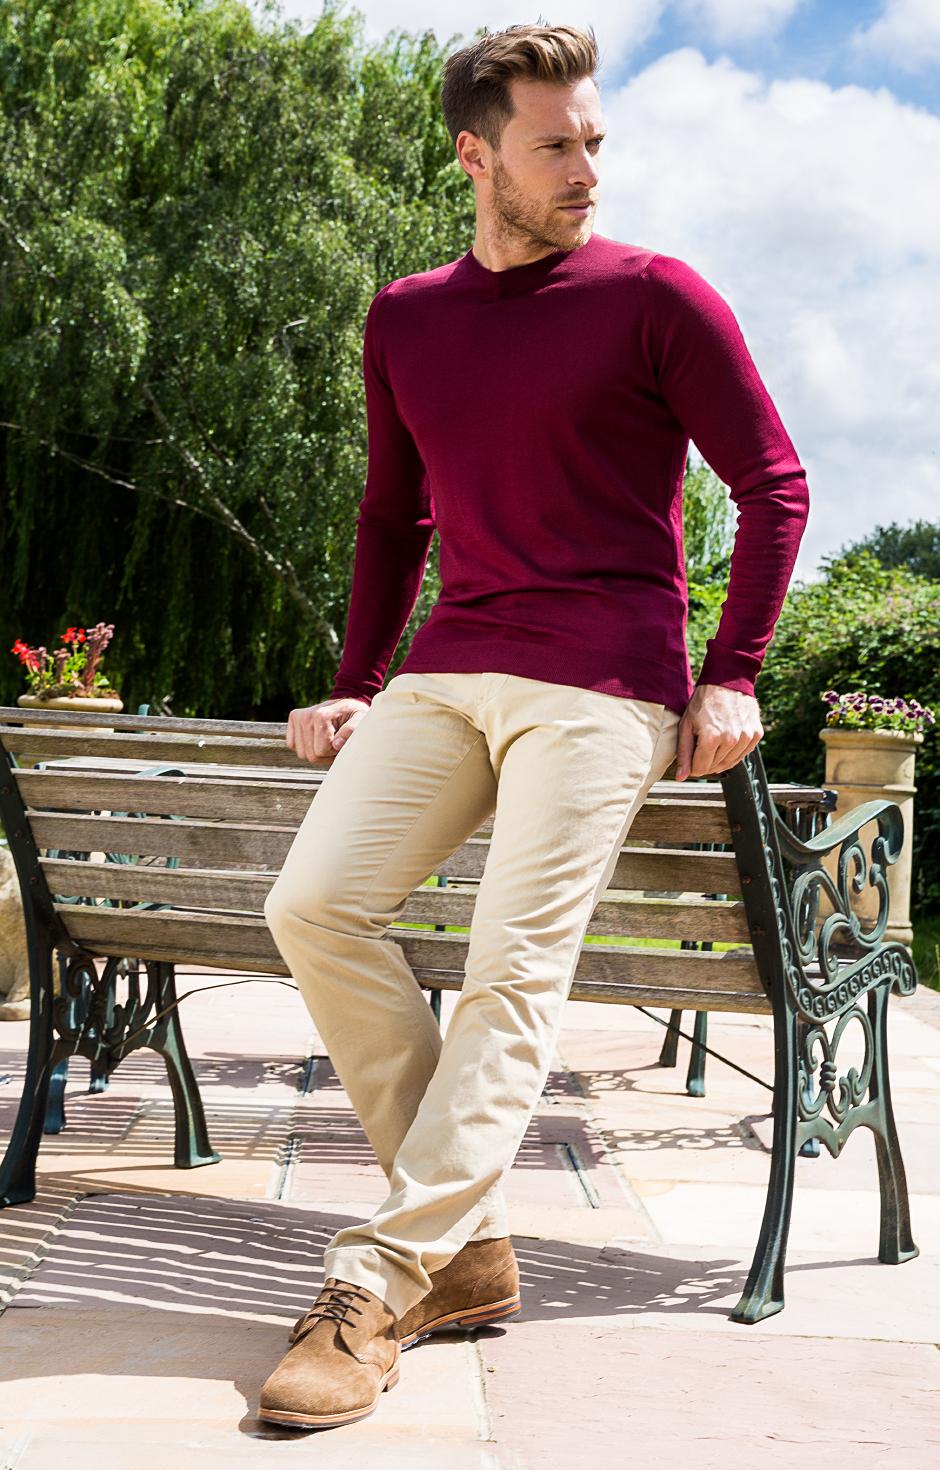 4817fbd9061109 Brand Spotlight: John Smedley's World Famous Knitwear